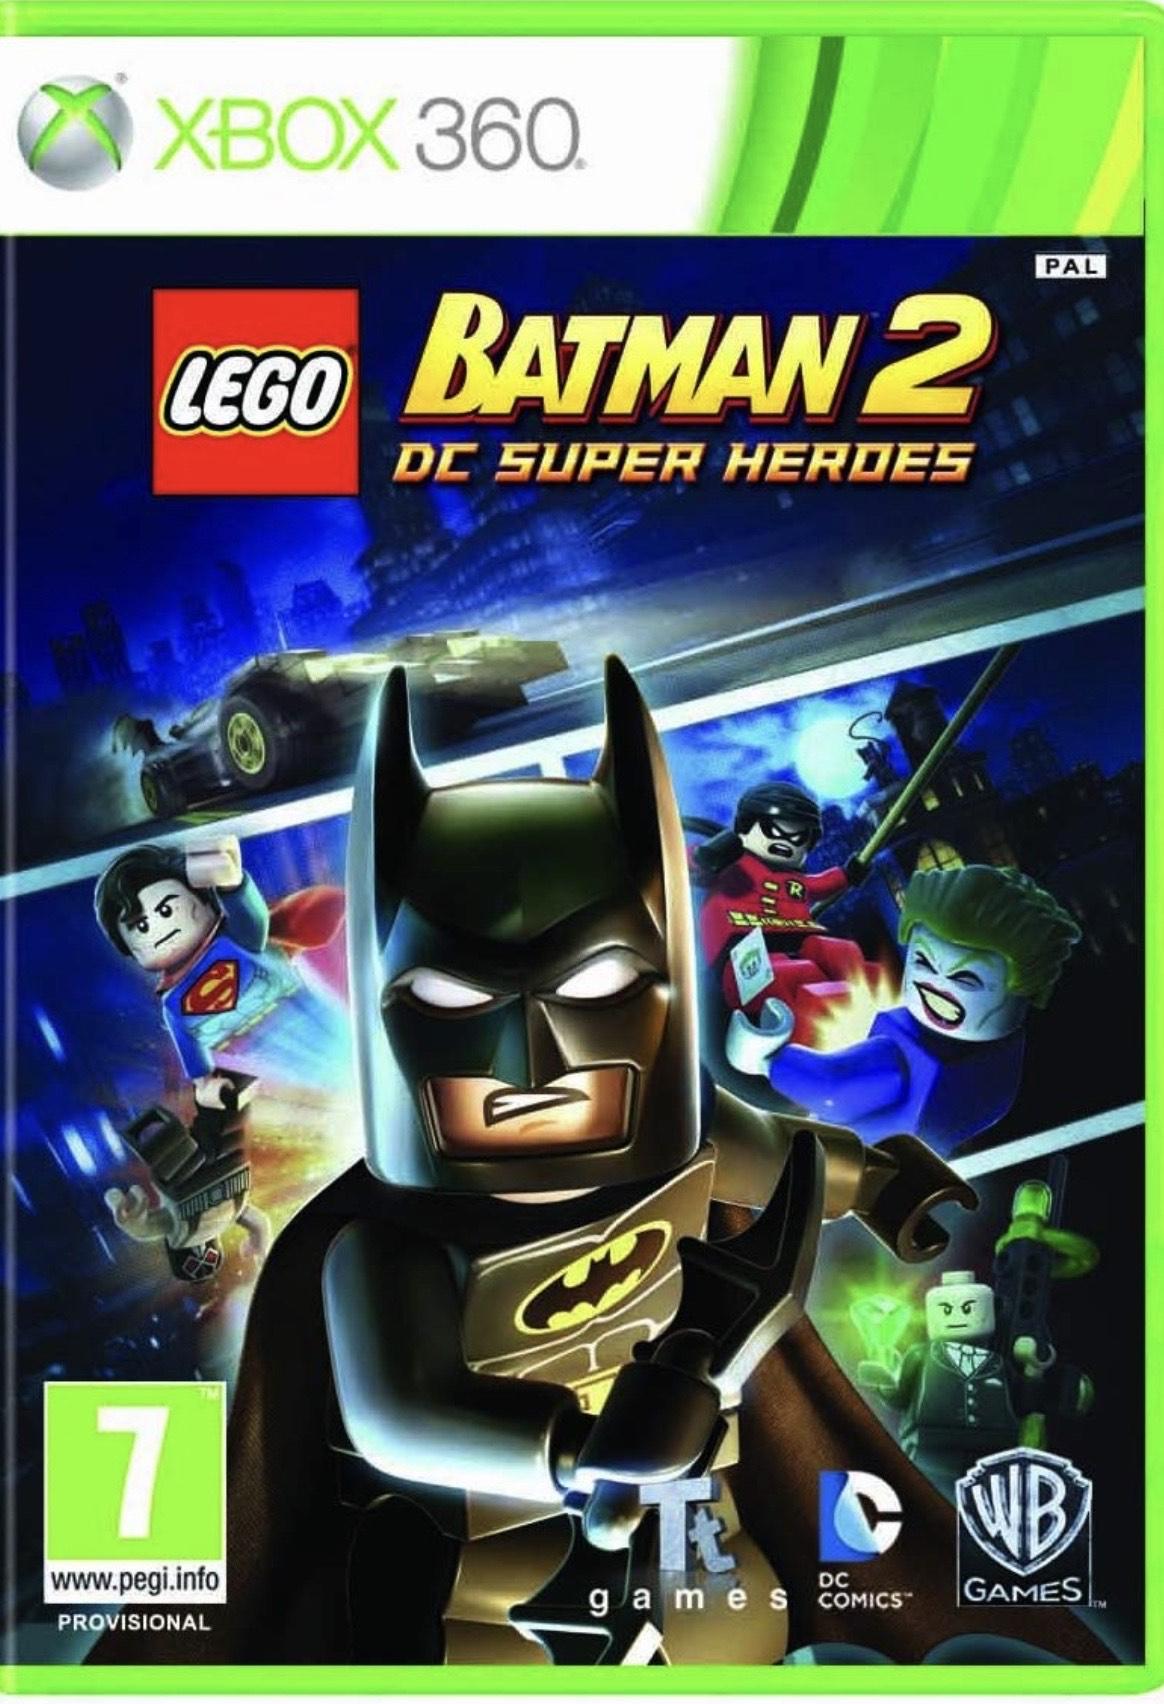 LEGO Batman 2: DC Super Heroes (Xbox 360/Xbox one) £1.87 @ Xbox.com Store